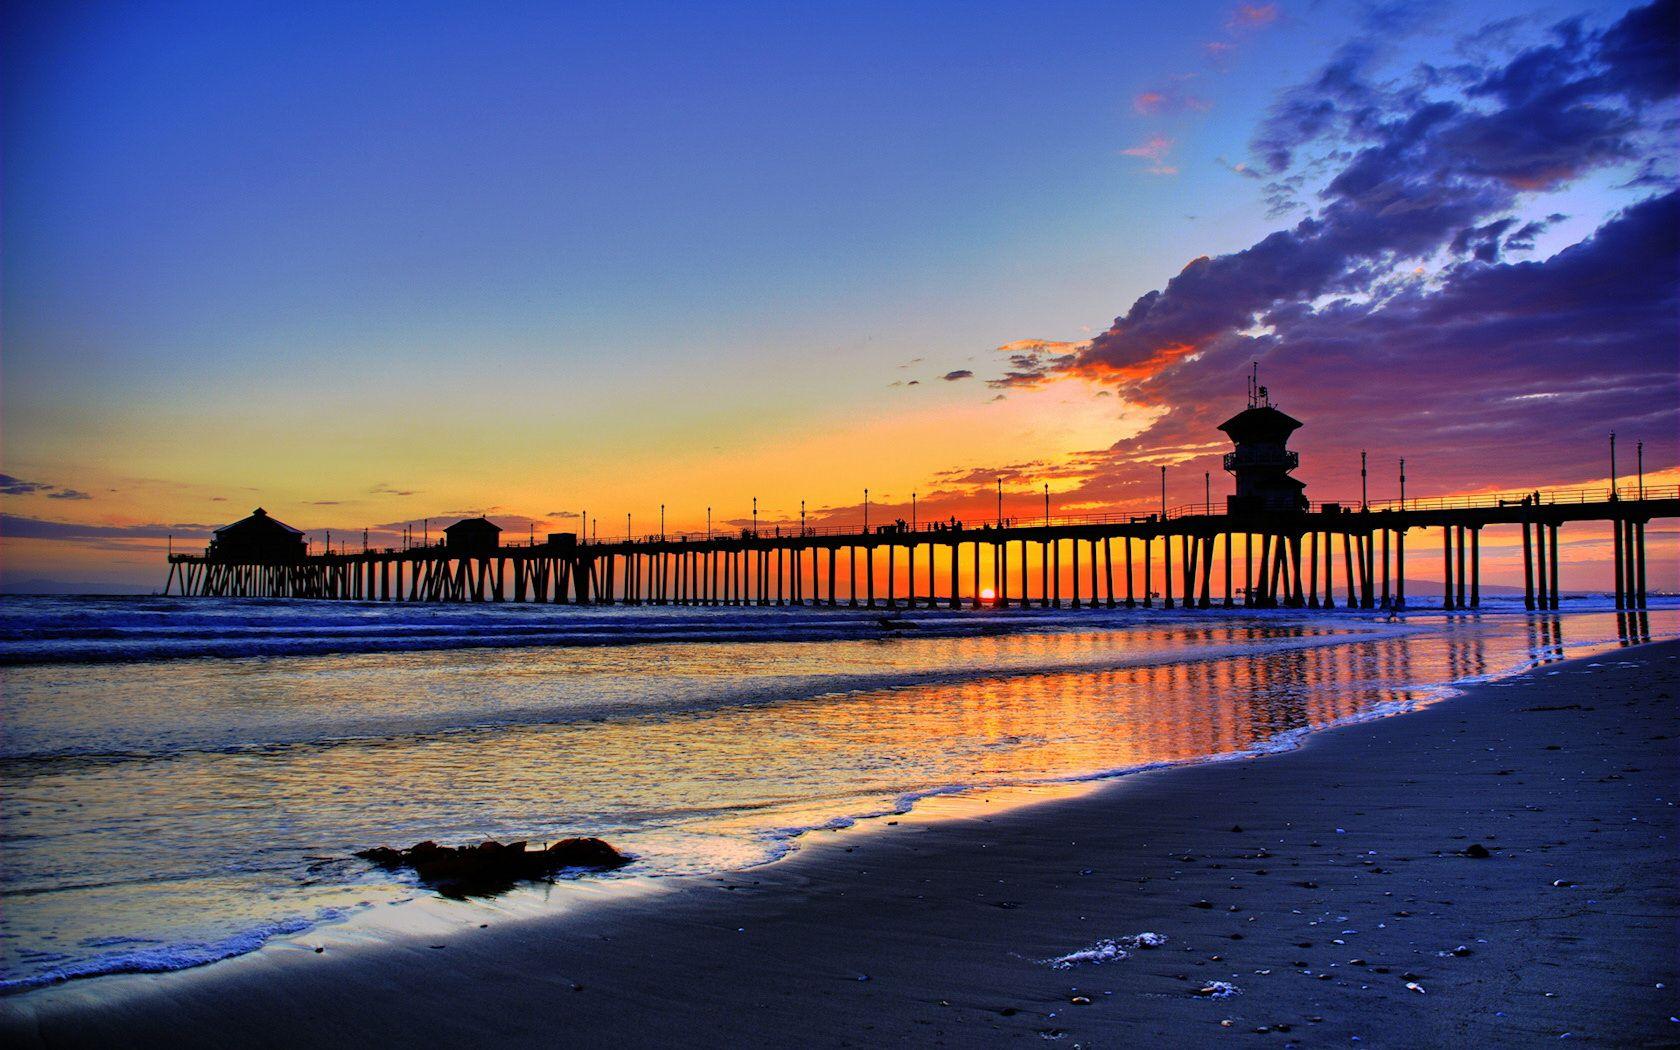 Wallpaper Ocean Sunset Usa California Evening Jetty Los Angeles Pier Huntington Beach At